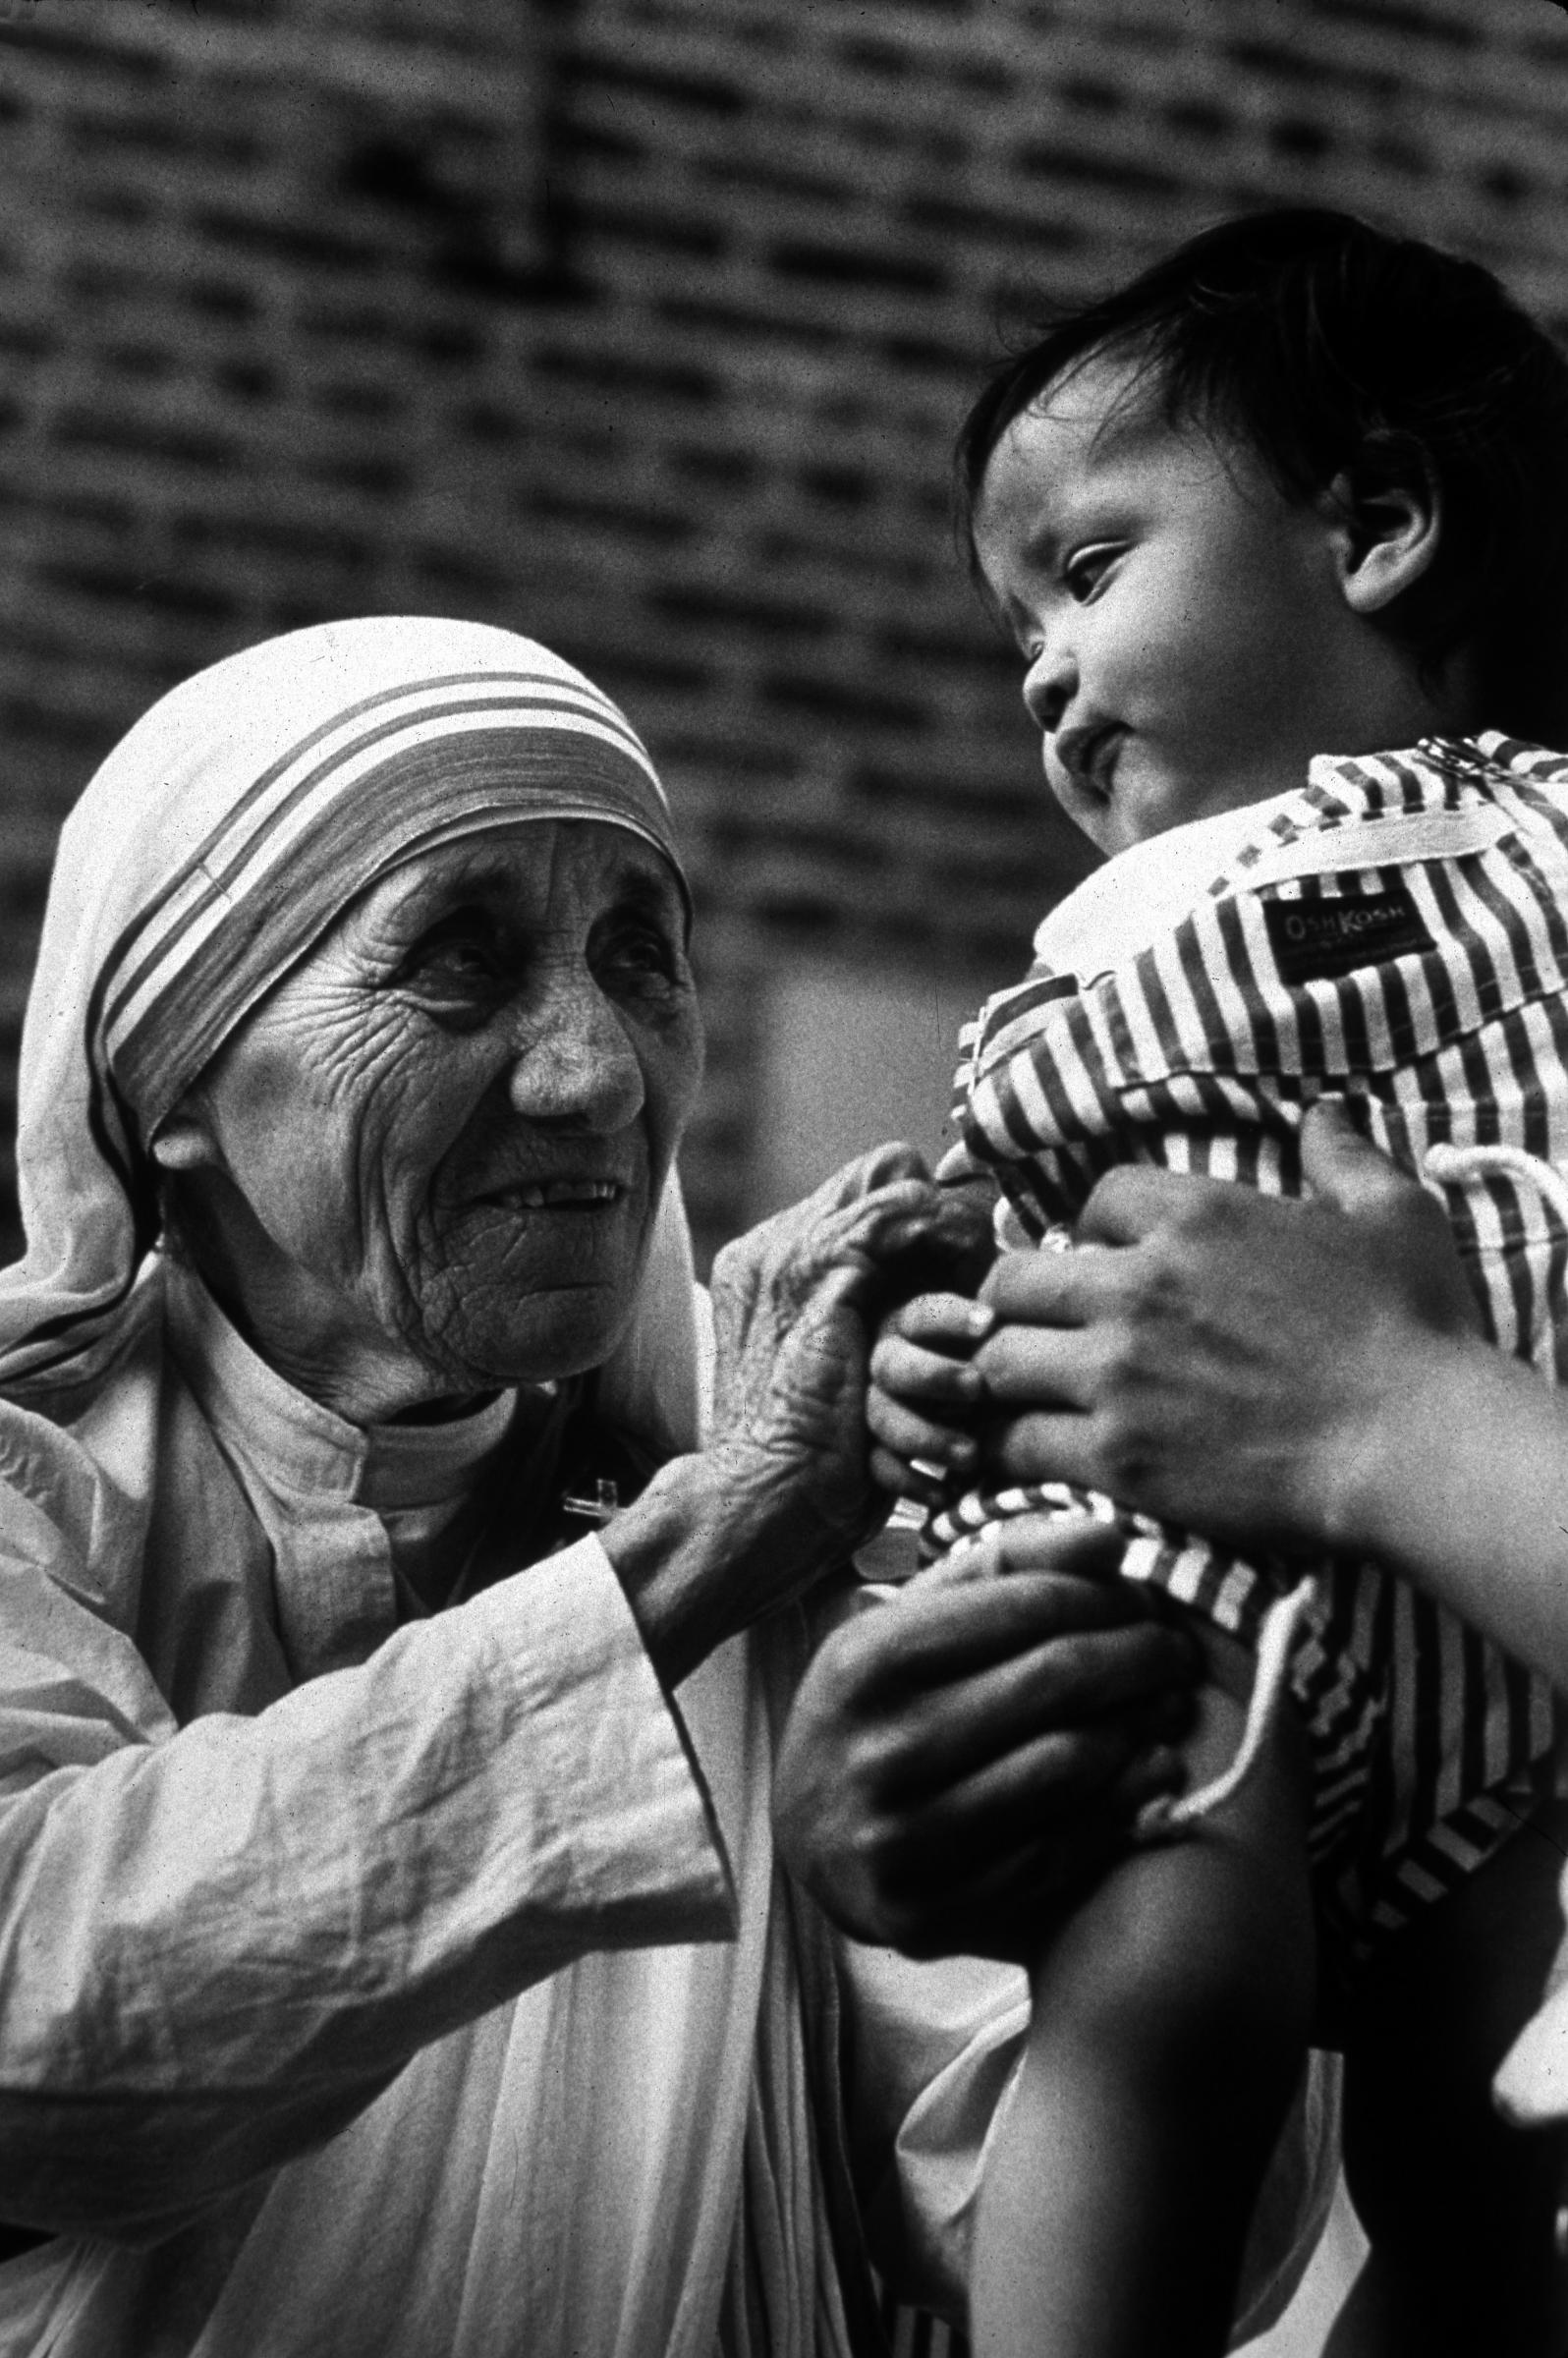 madre teresa poveri malati bisognosi